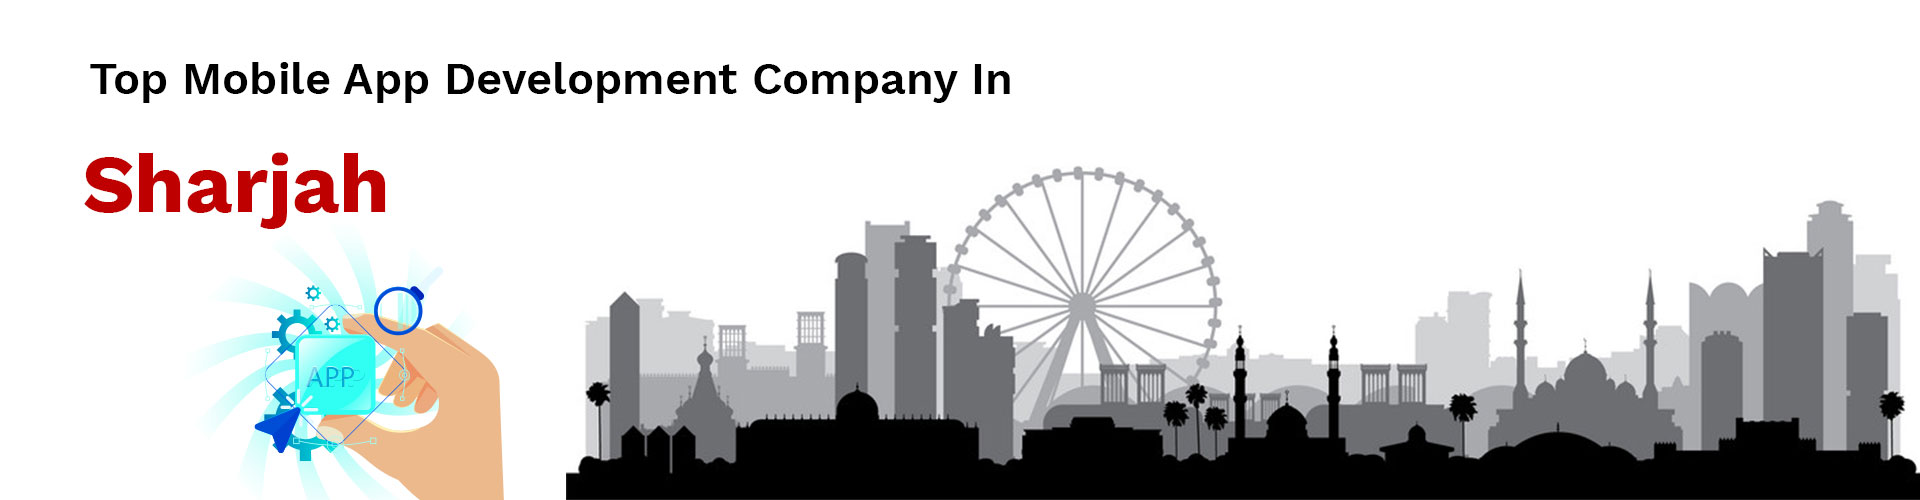 mobile app development company sharjah